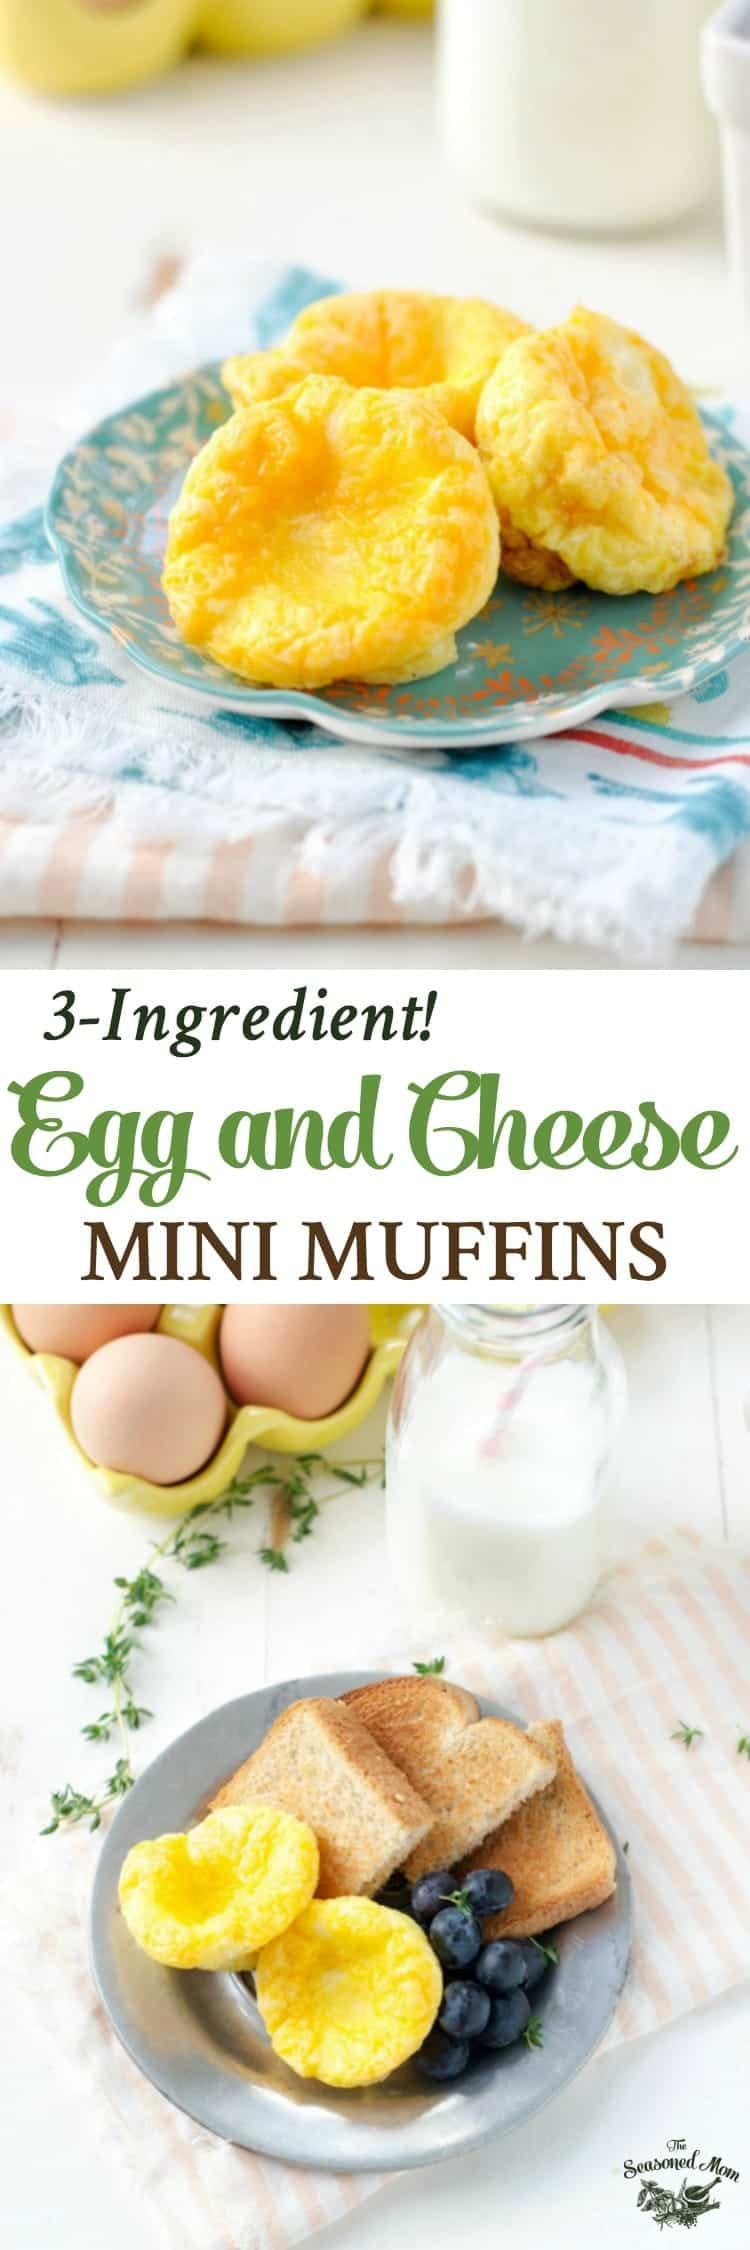 Egg And Cheese Mini Muffins The Seasoned Mom